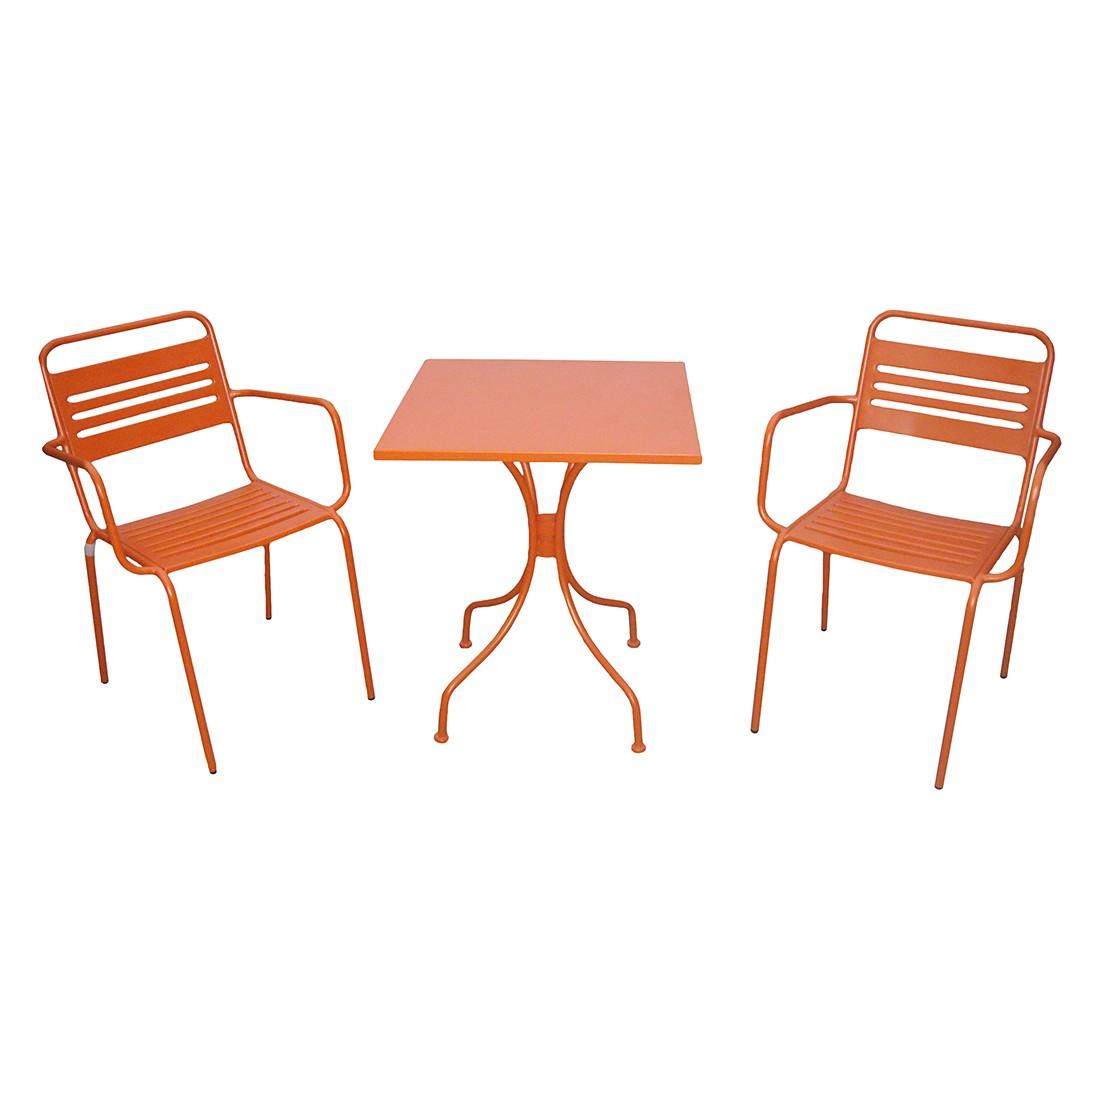 Balkonmöbelset Jovy (3-teilig) - Stahl Orange, Garden Guerilla